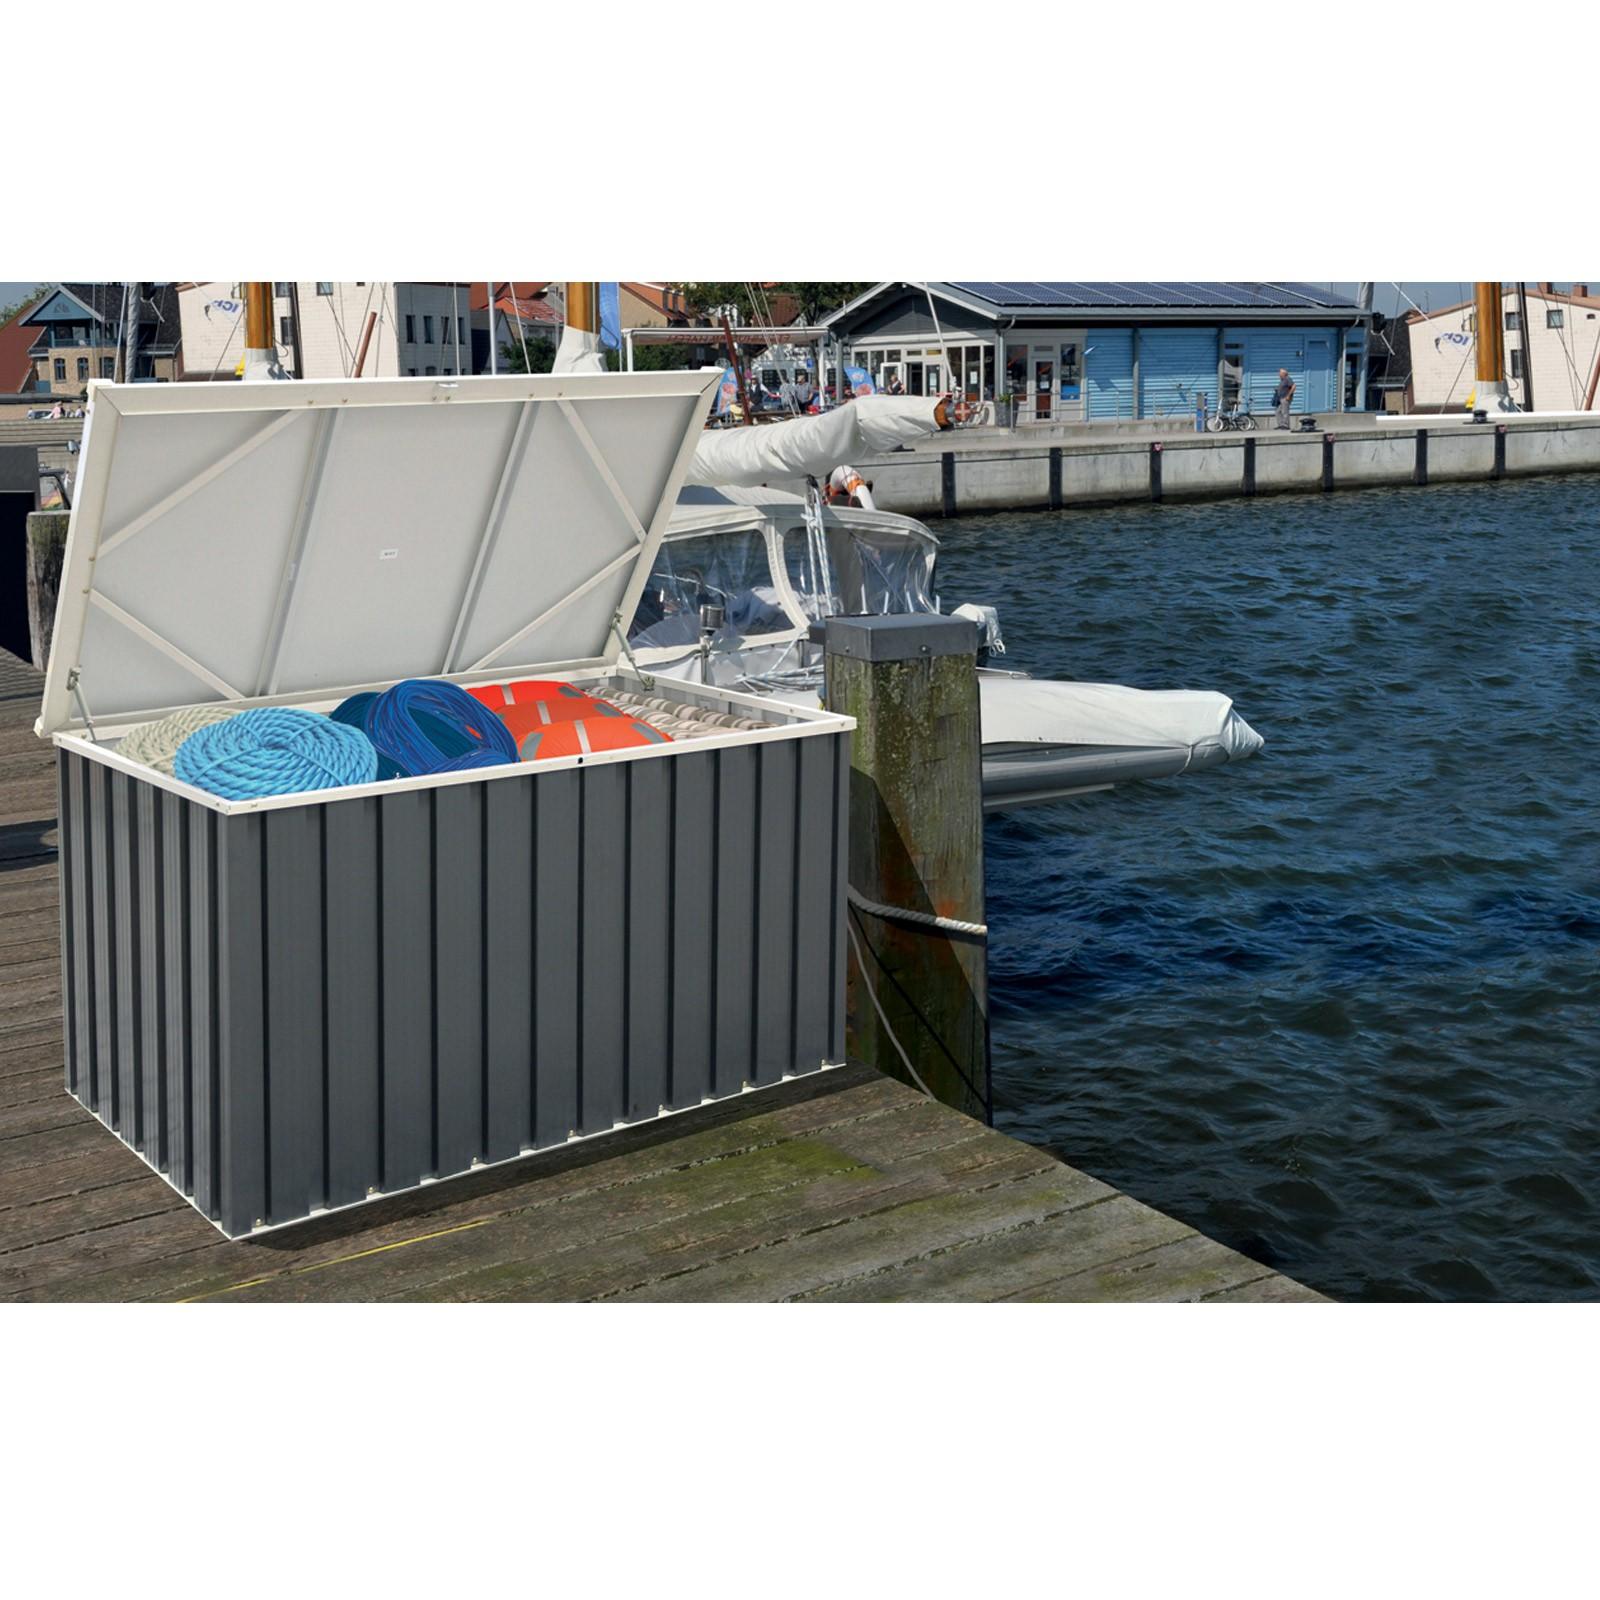 keter metall ger tebox auflagenbox kissenbox gartenbox aufbewahrungskiste 135x70 ebay. Black Bedroom Furniture Sets. Home Design Ideas